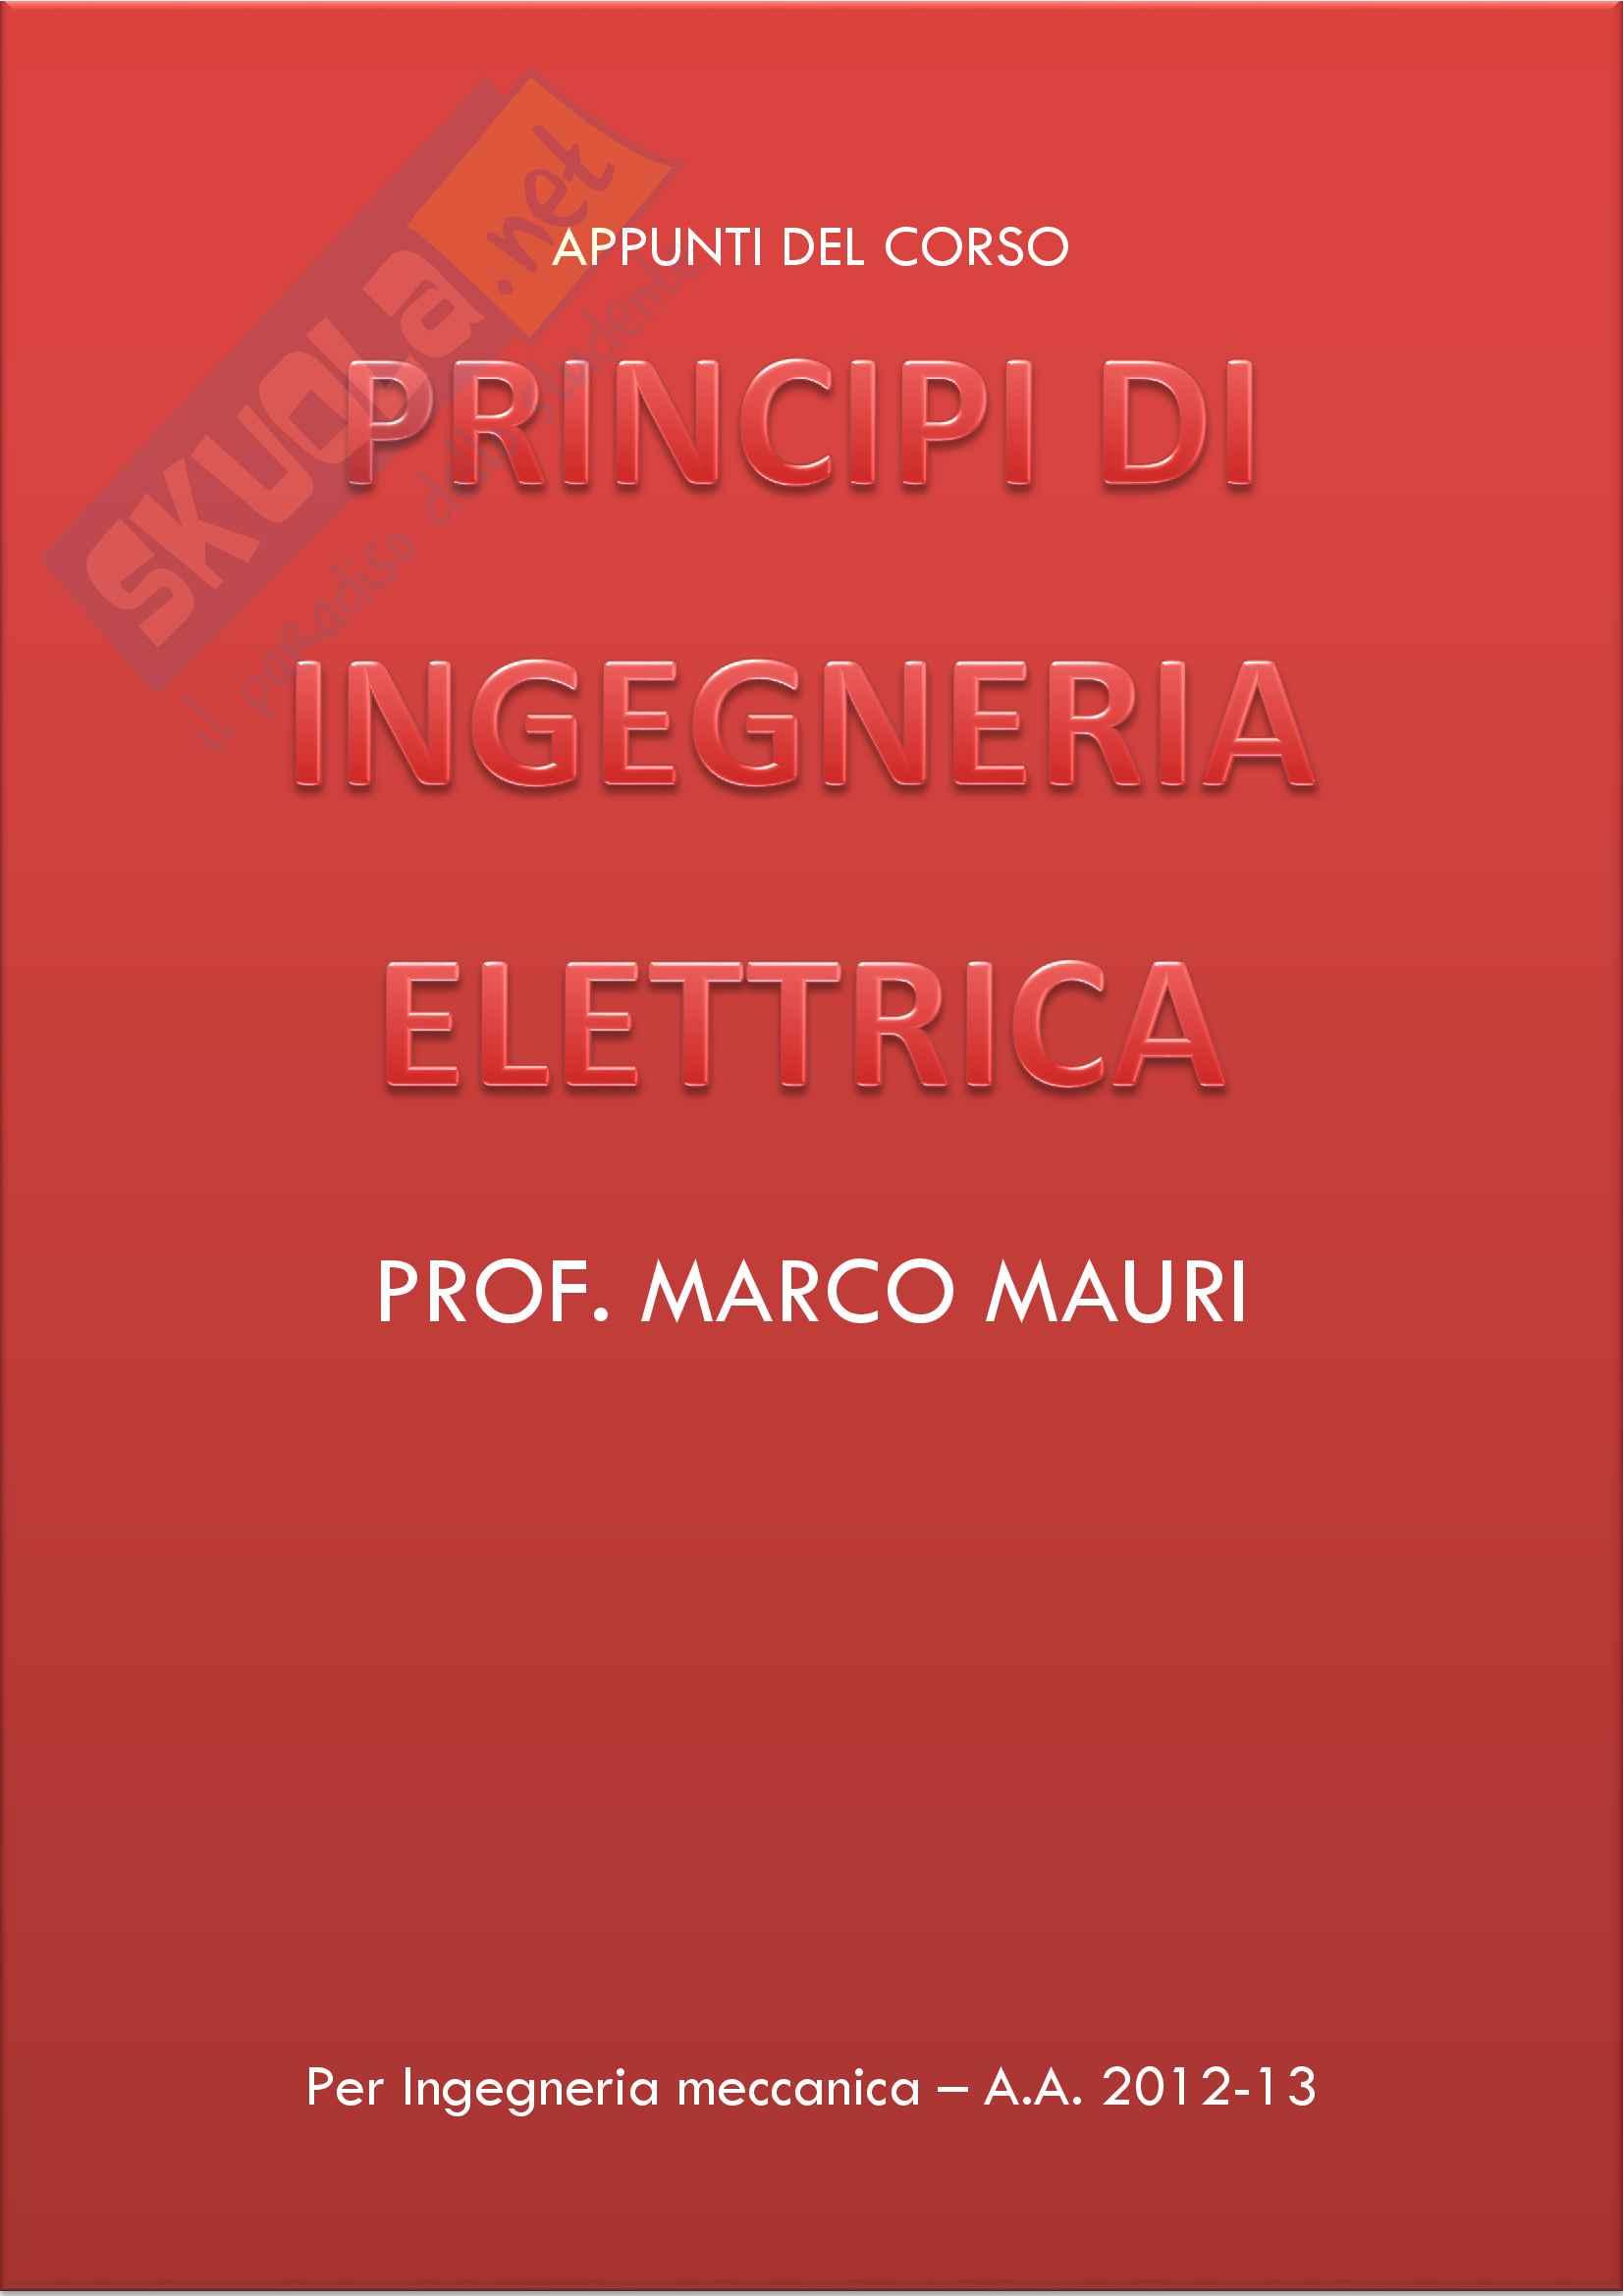 appunto M. Mauri Principi di ingegneria elettrica